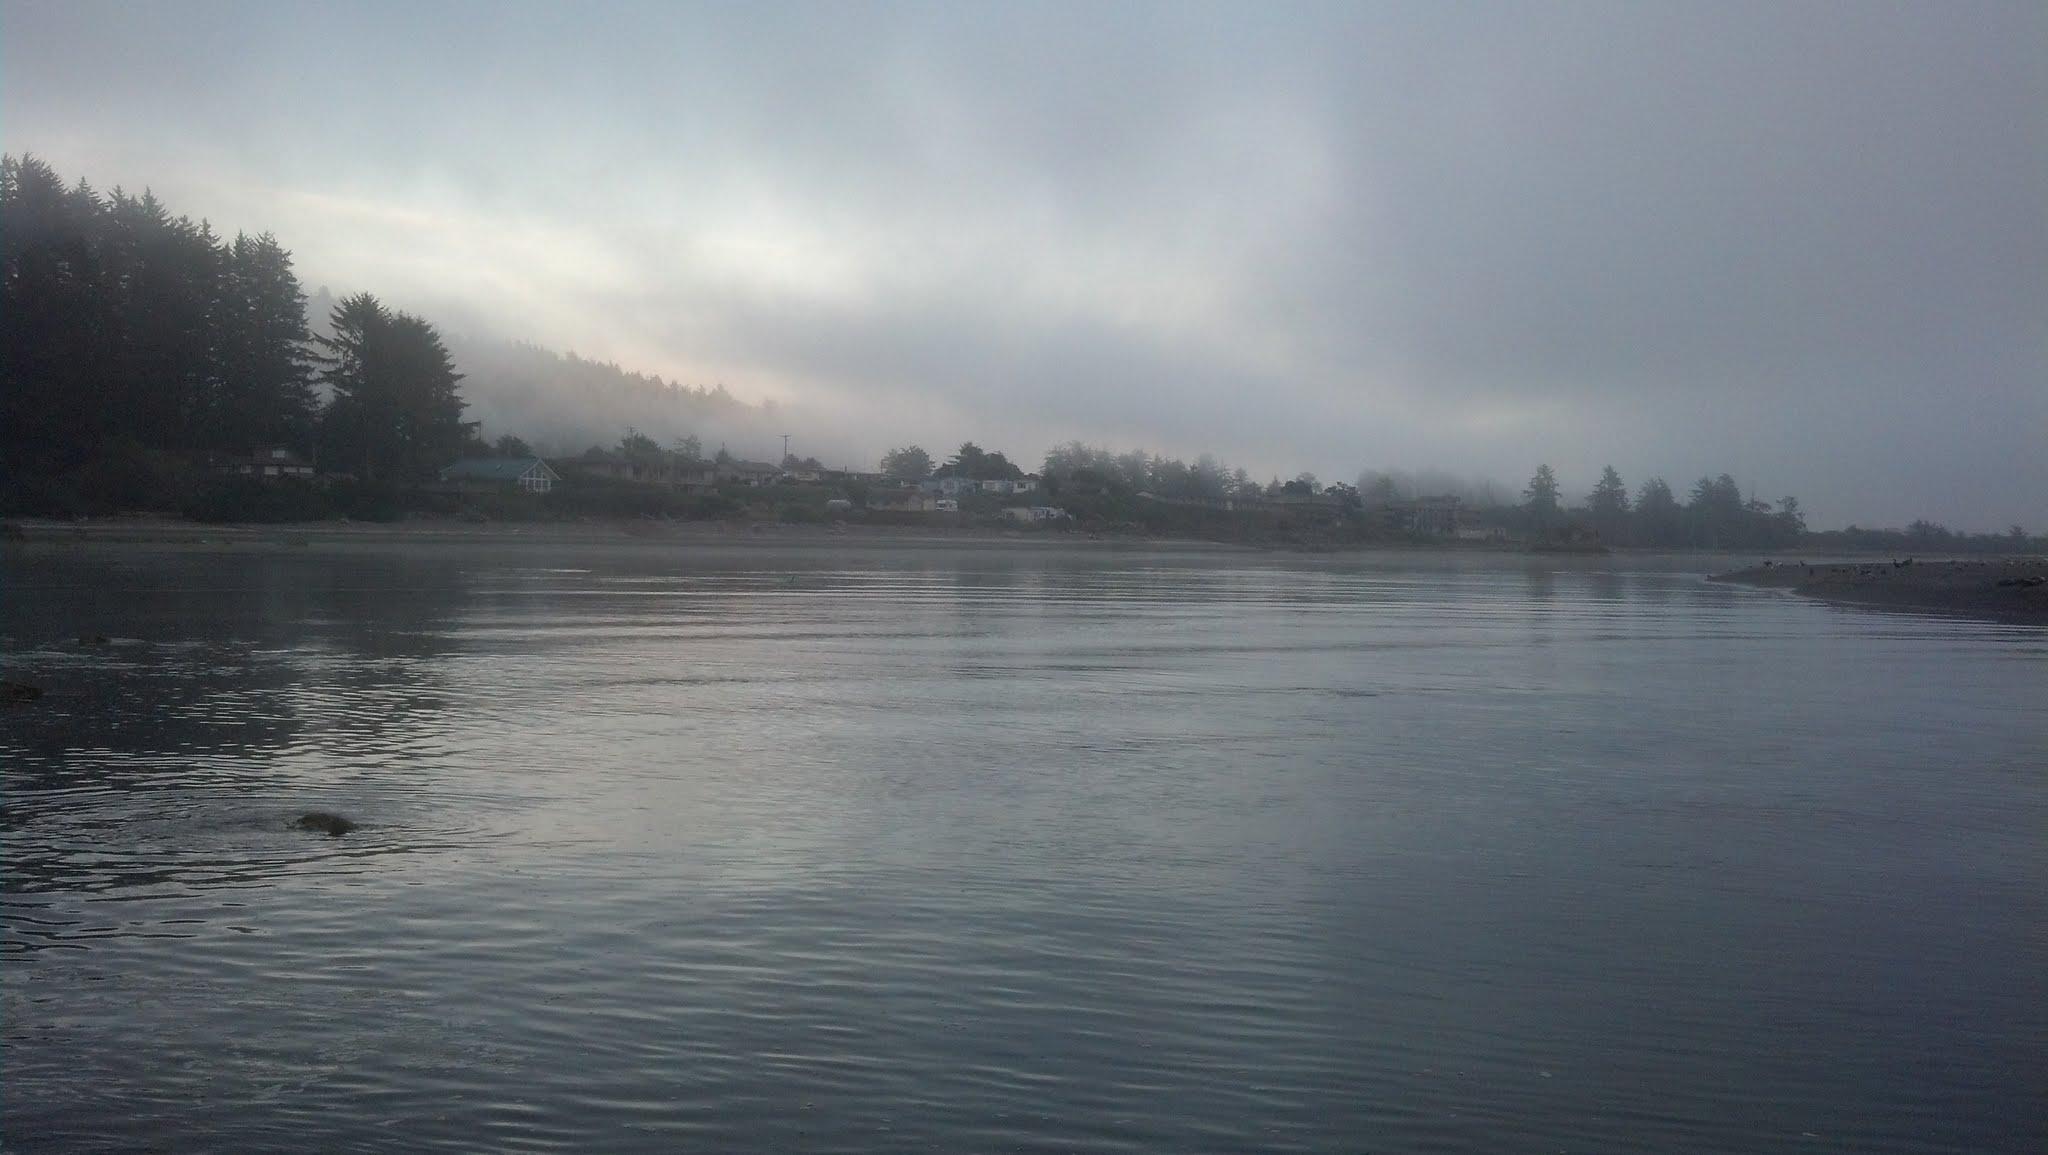 Shortstop Salmon Harbor Resort Smith River Ca Here